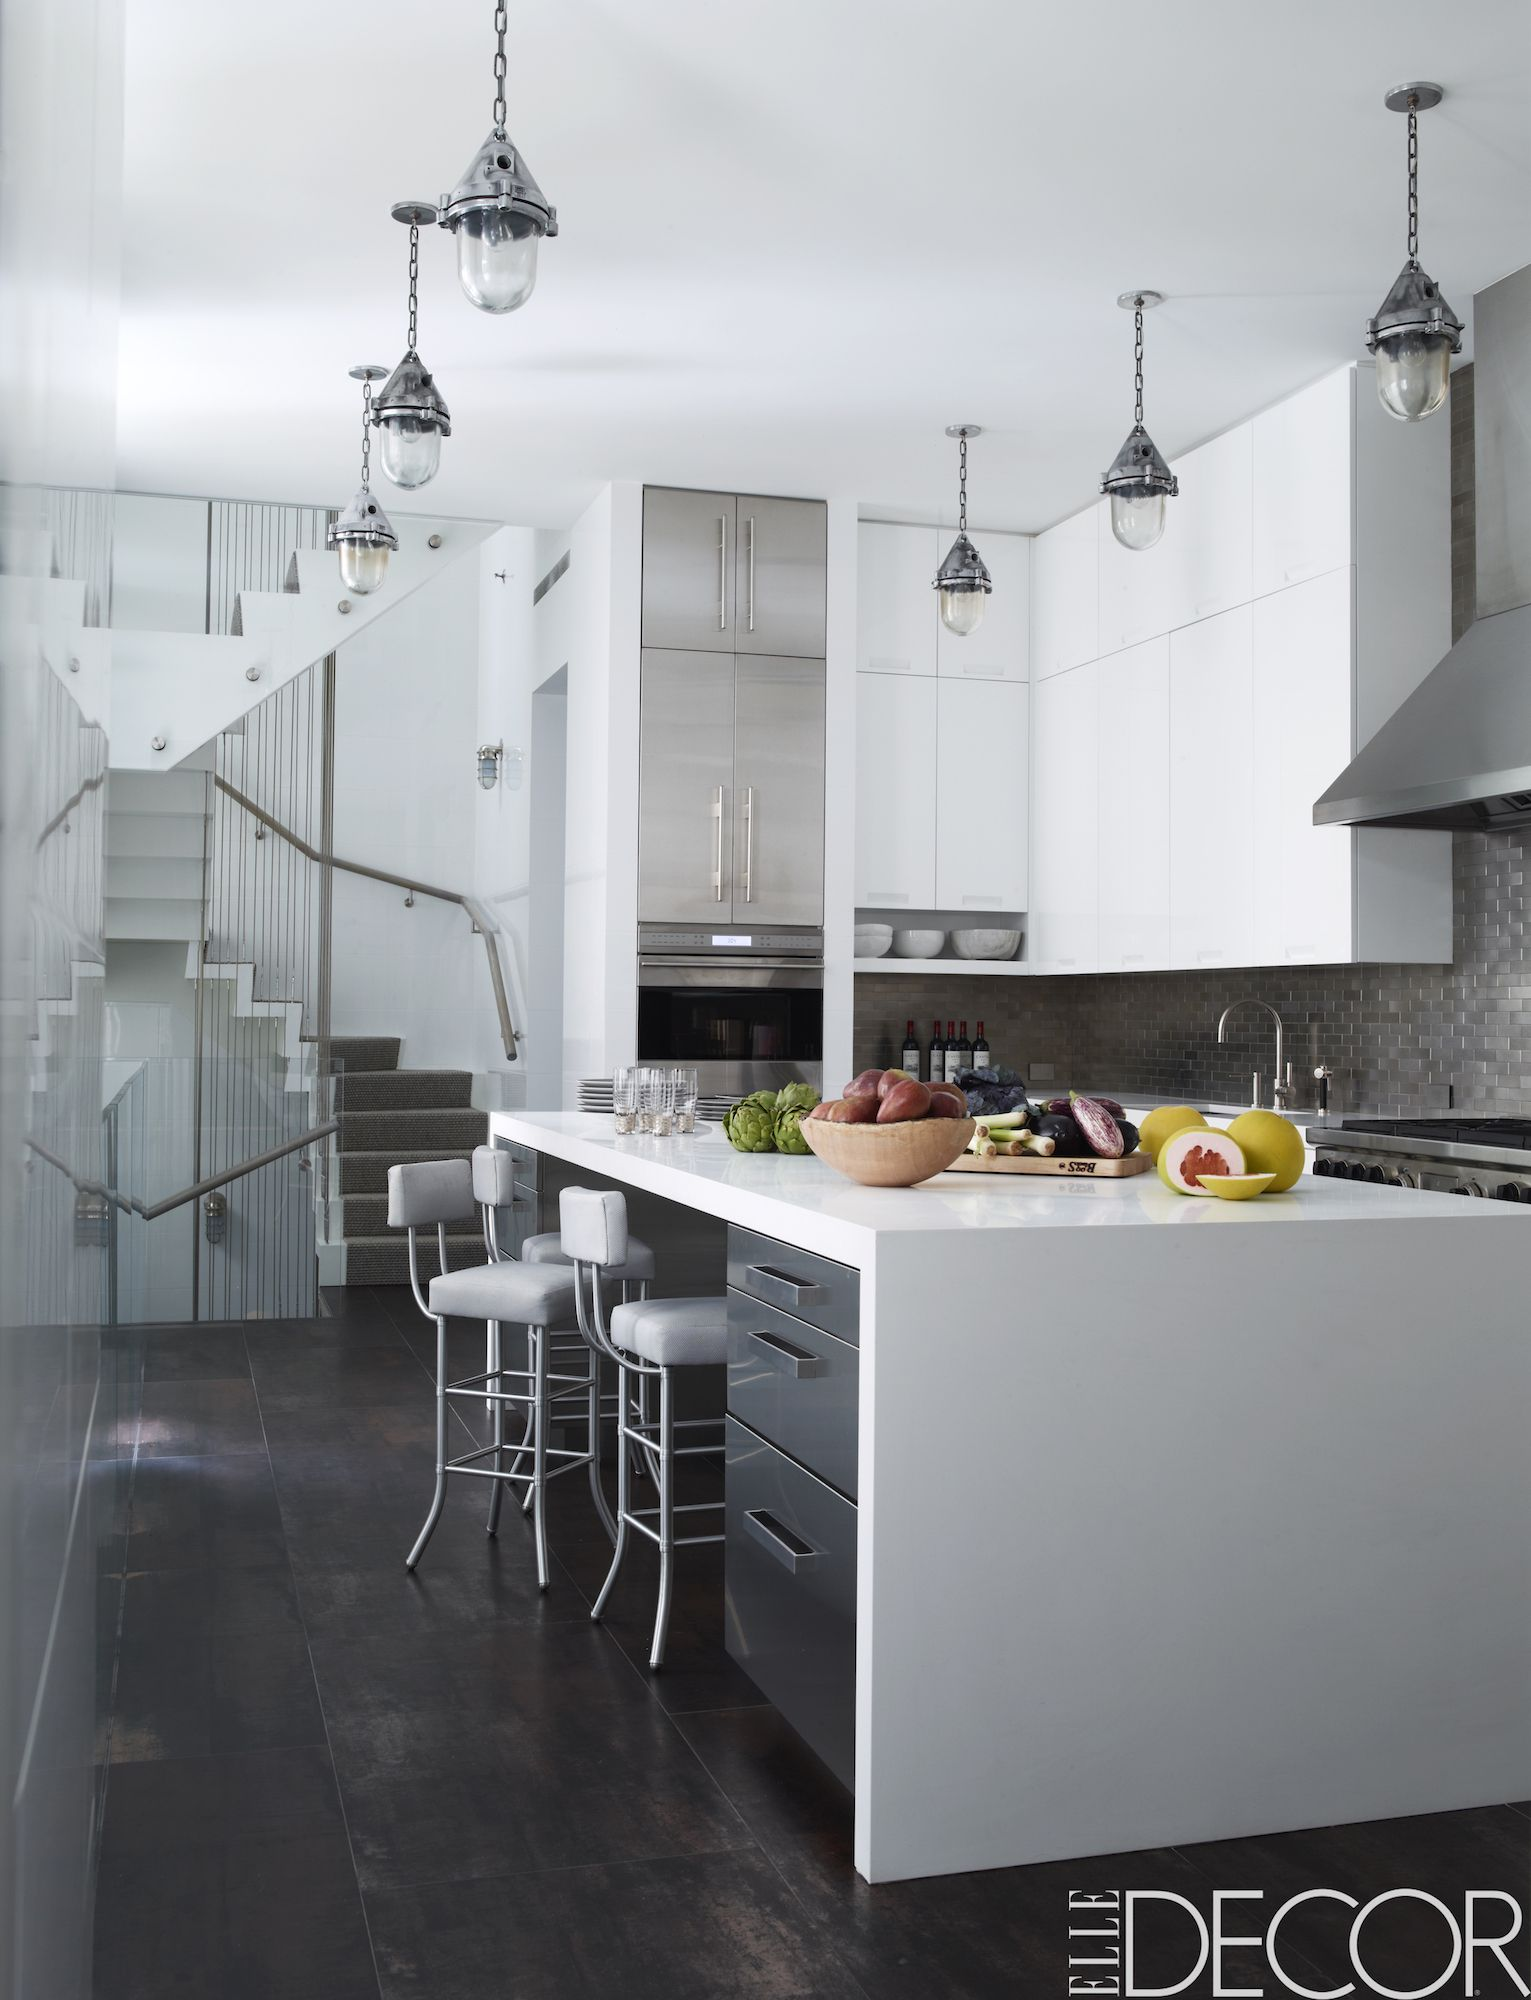 kitchen tiles design images. kitchen tiles design images